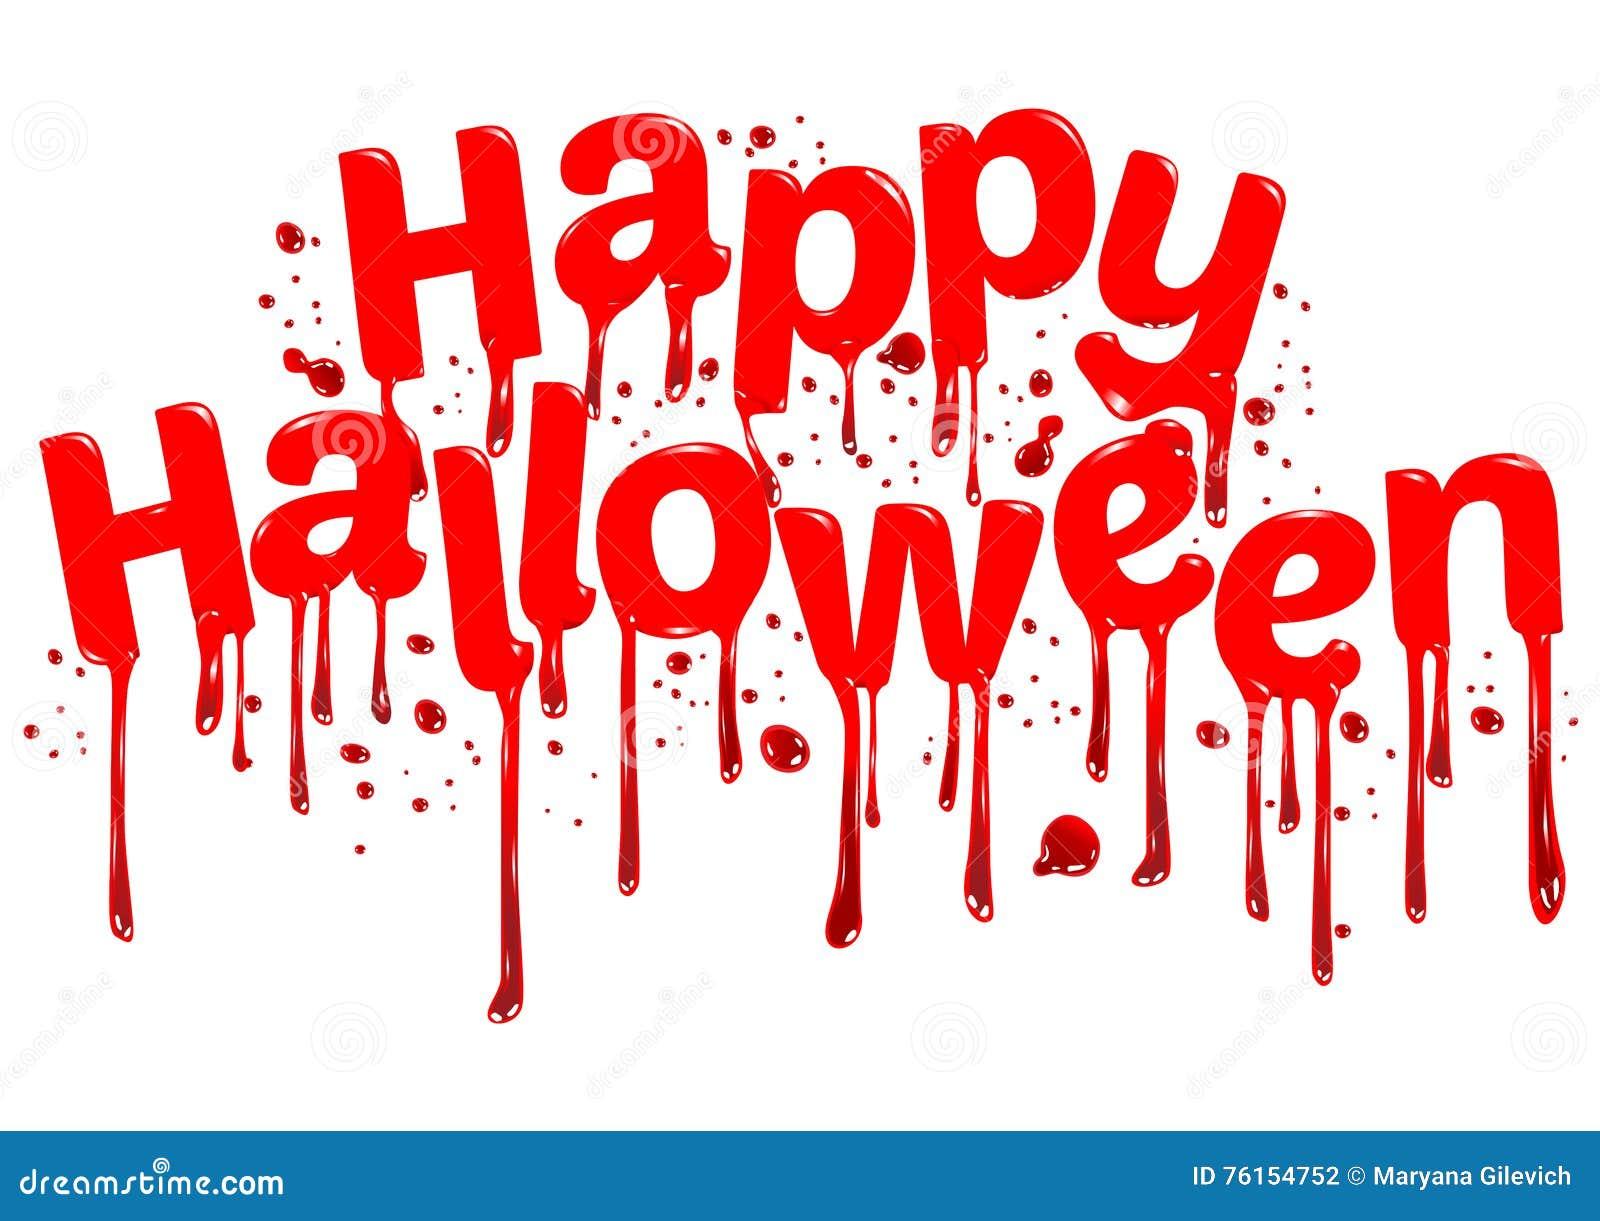 blood halloween - Blood For Halloween